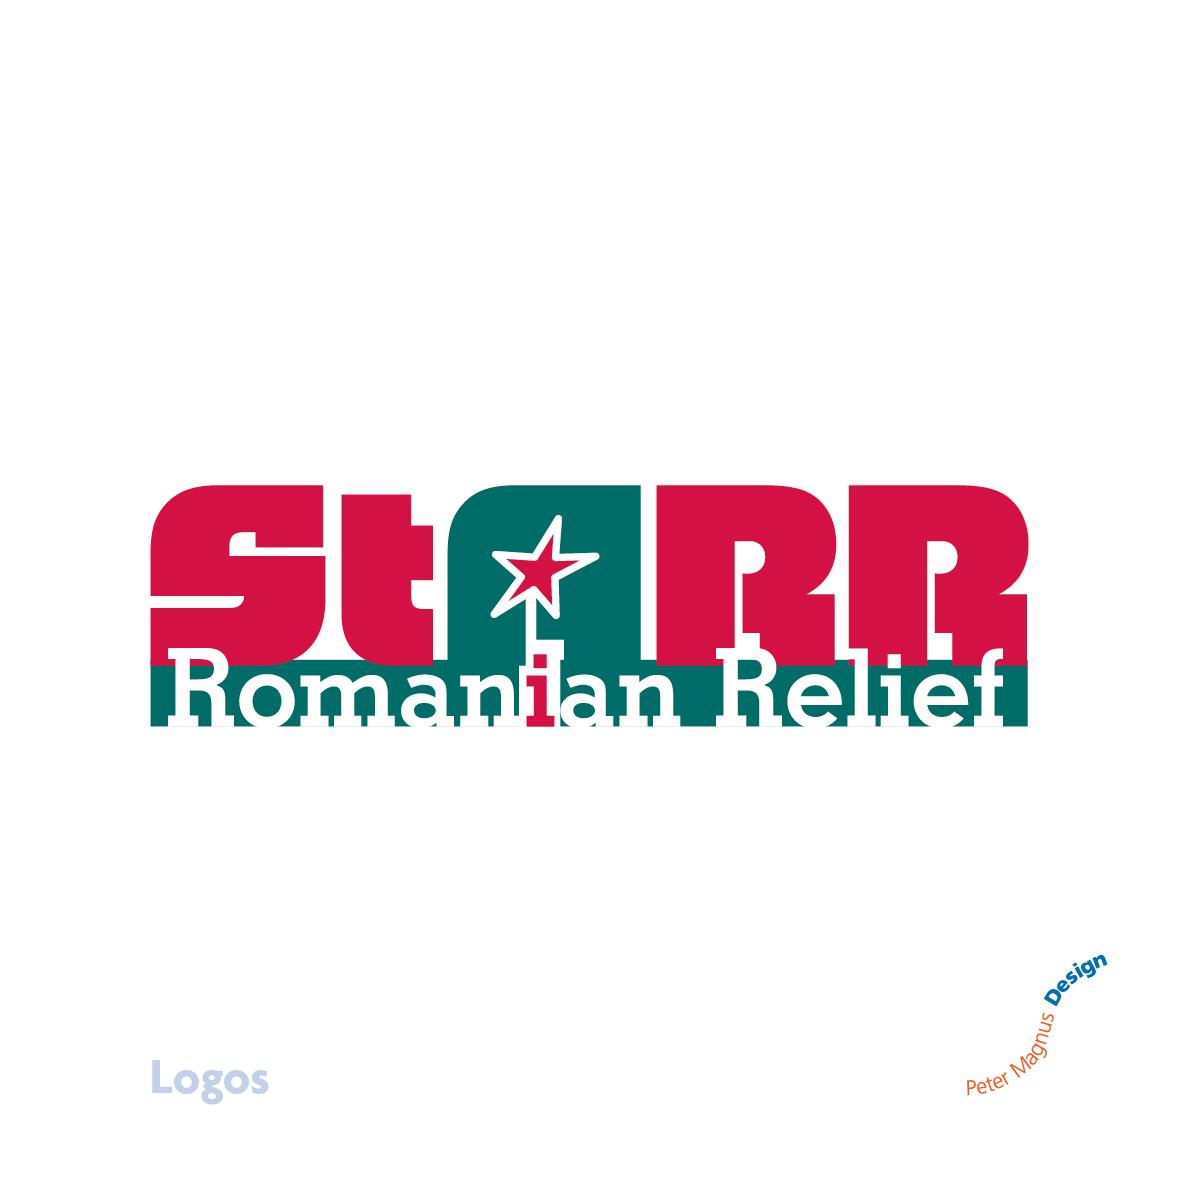 STARR Romanian Relief logo